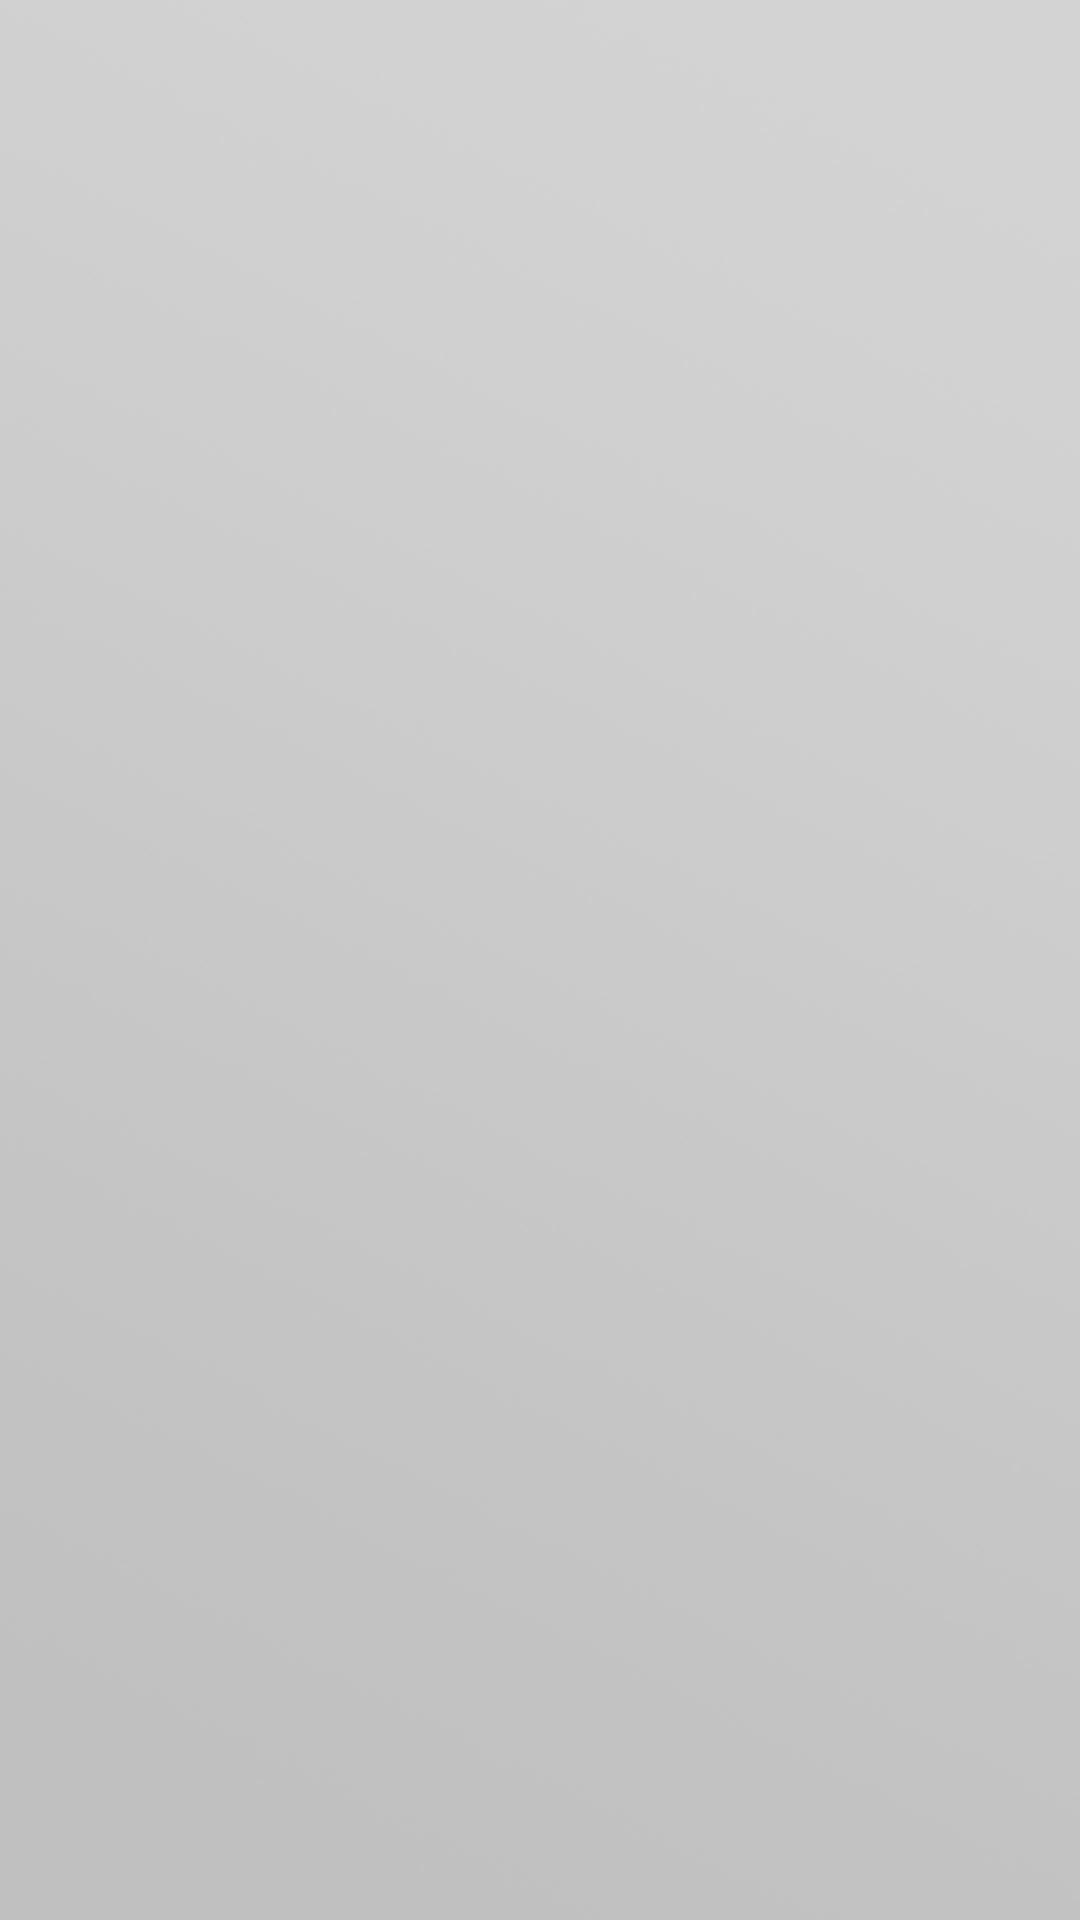 The Best 17 Aesthetic Dark Grey Plain Background